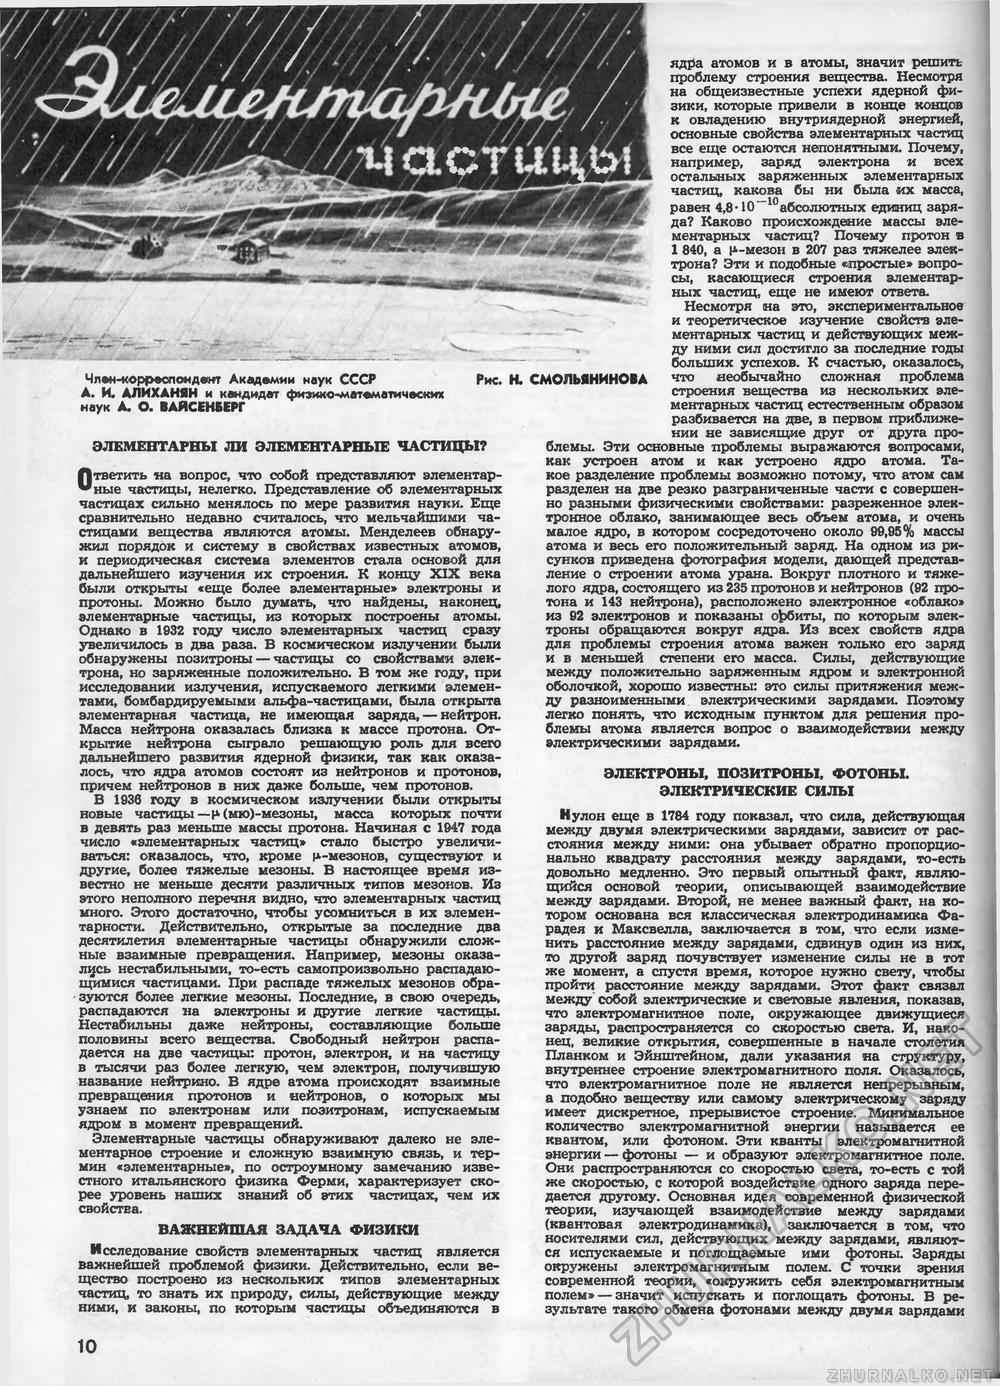 chlen-korrespondent-akademii-nauk